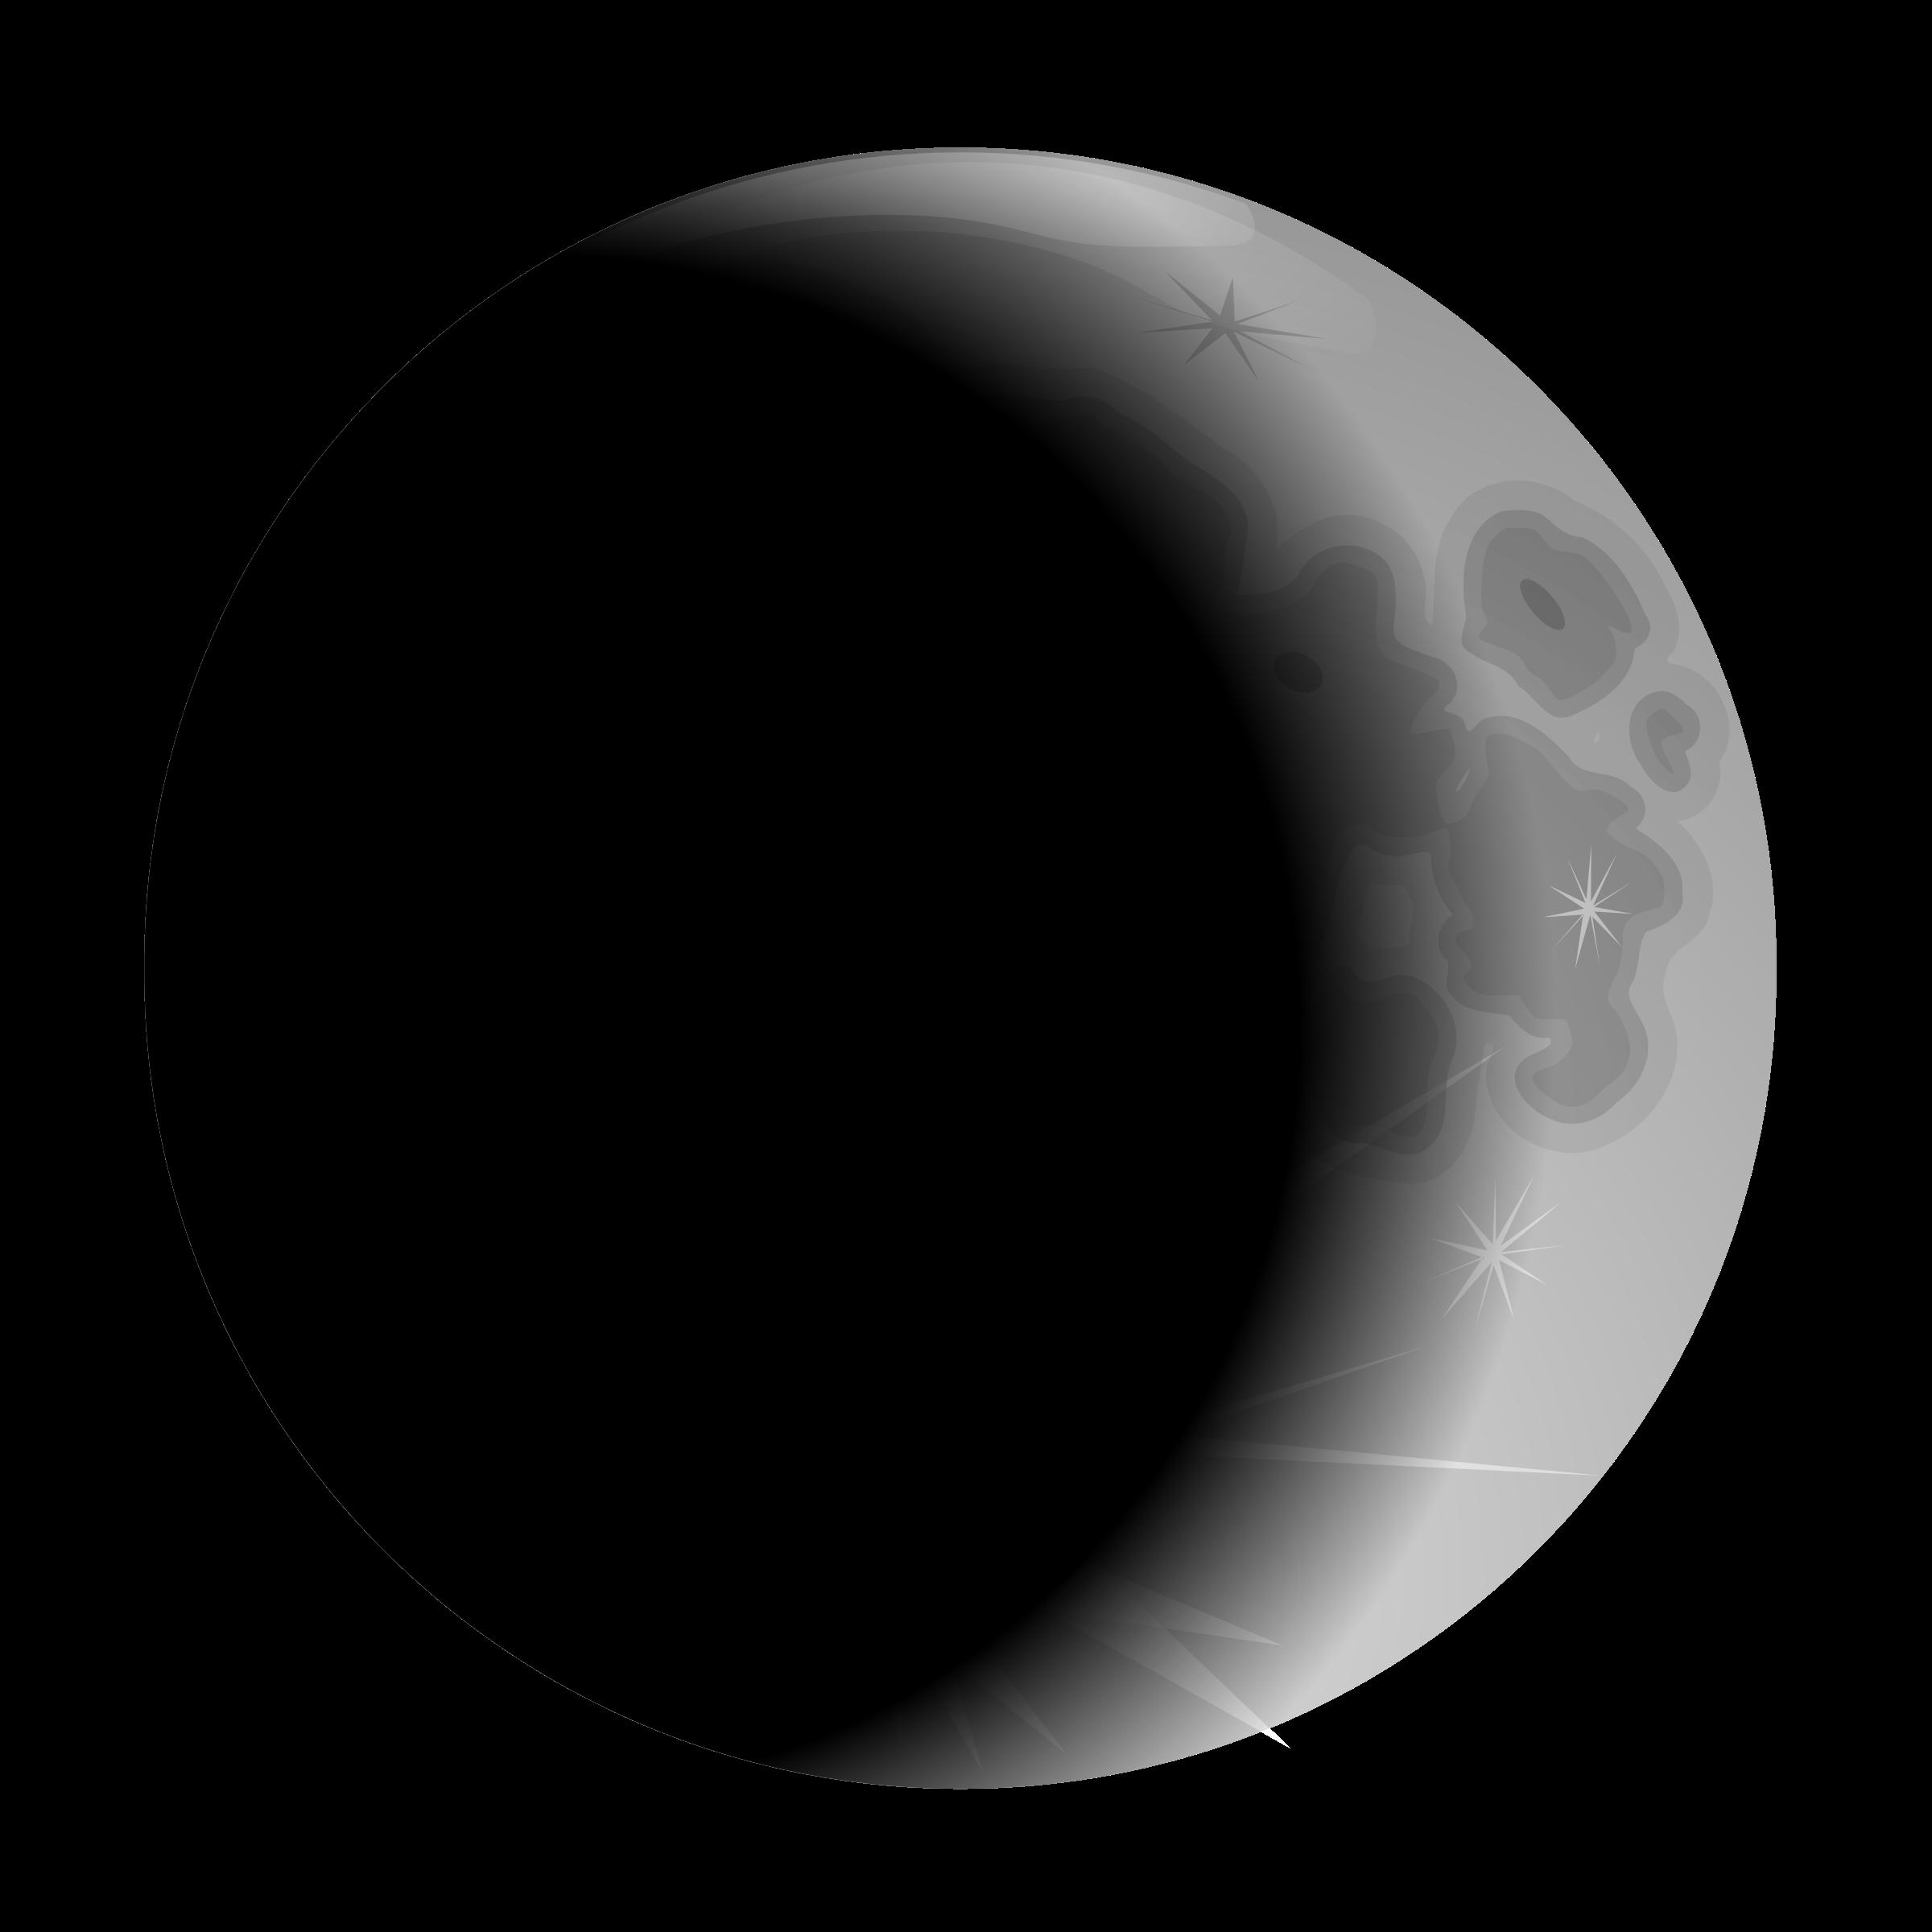 image transparent Moon big image png. Crescent clipart space